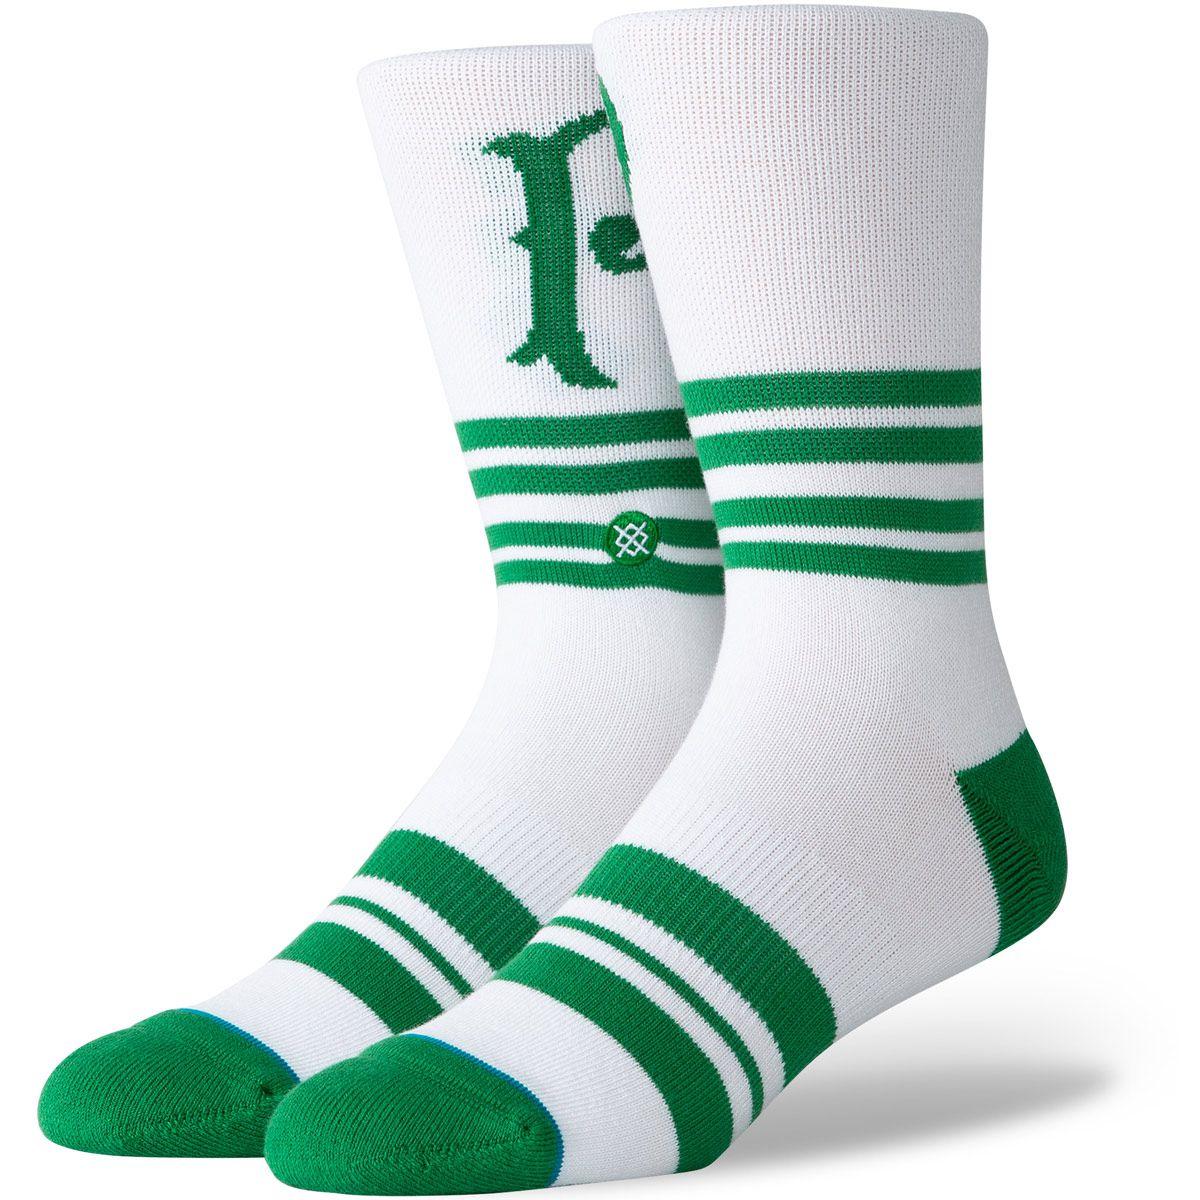 Meia Palmeiras Stance Stripe